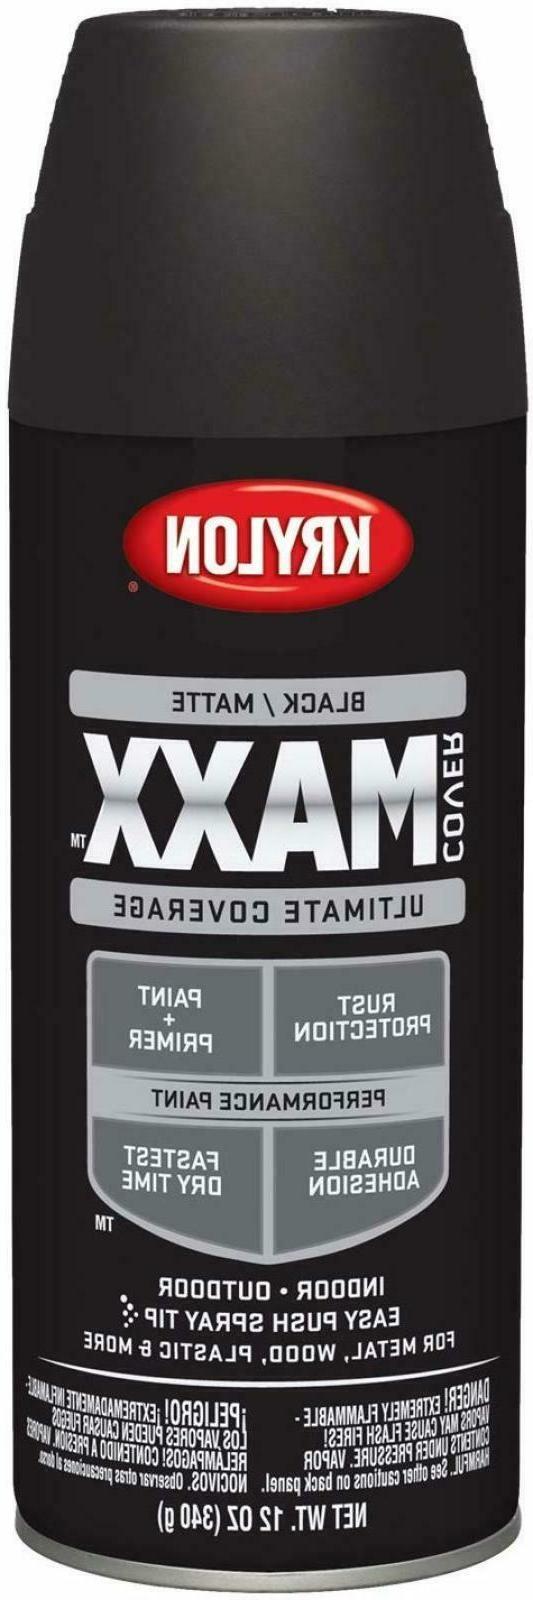 12 Ounce Matte Black K09198000 COVERMAXX Wall Spray Paint Tr